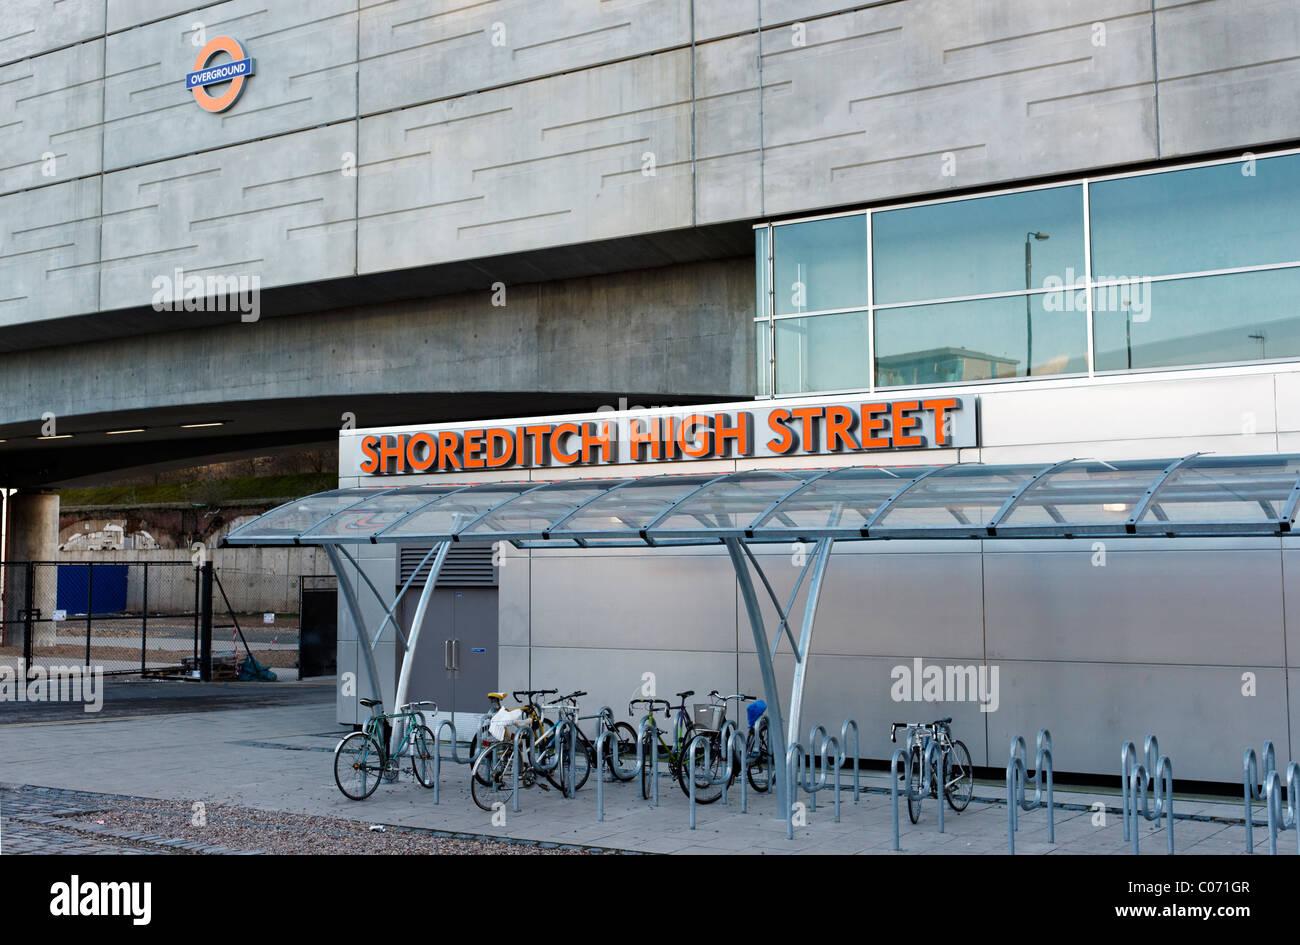 Shoreditch overground train station - Stock Image